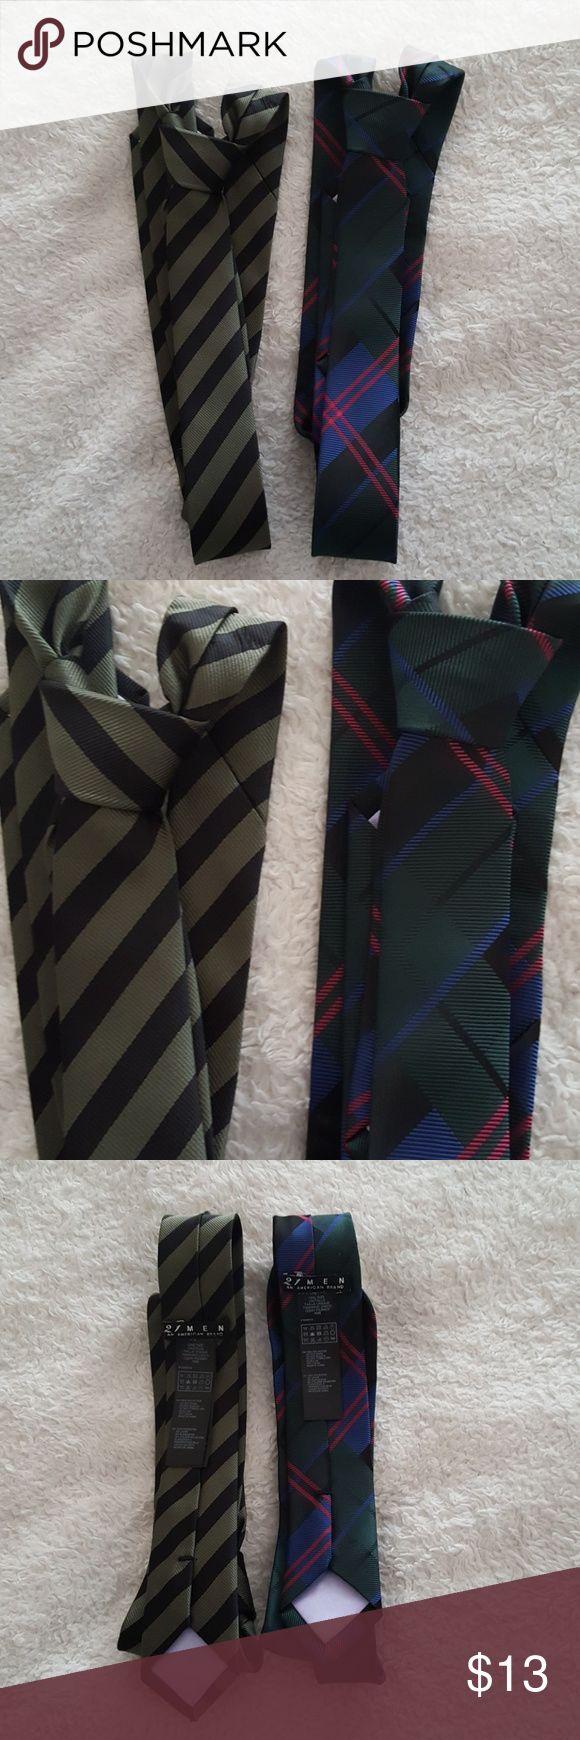 [JUST ADDED] Forever 21 Men Slim Tie Bundle Forever 21 Men Slim Tie Bundle. Striped designs. New without tags. 100% Polyester. 21men Accessories Ties